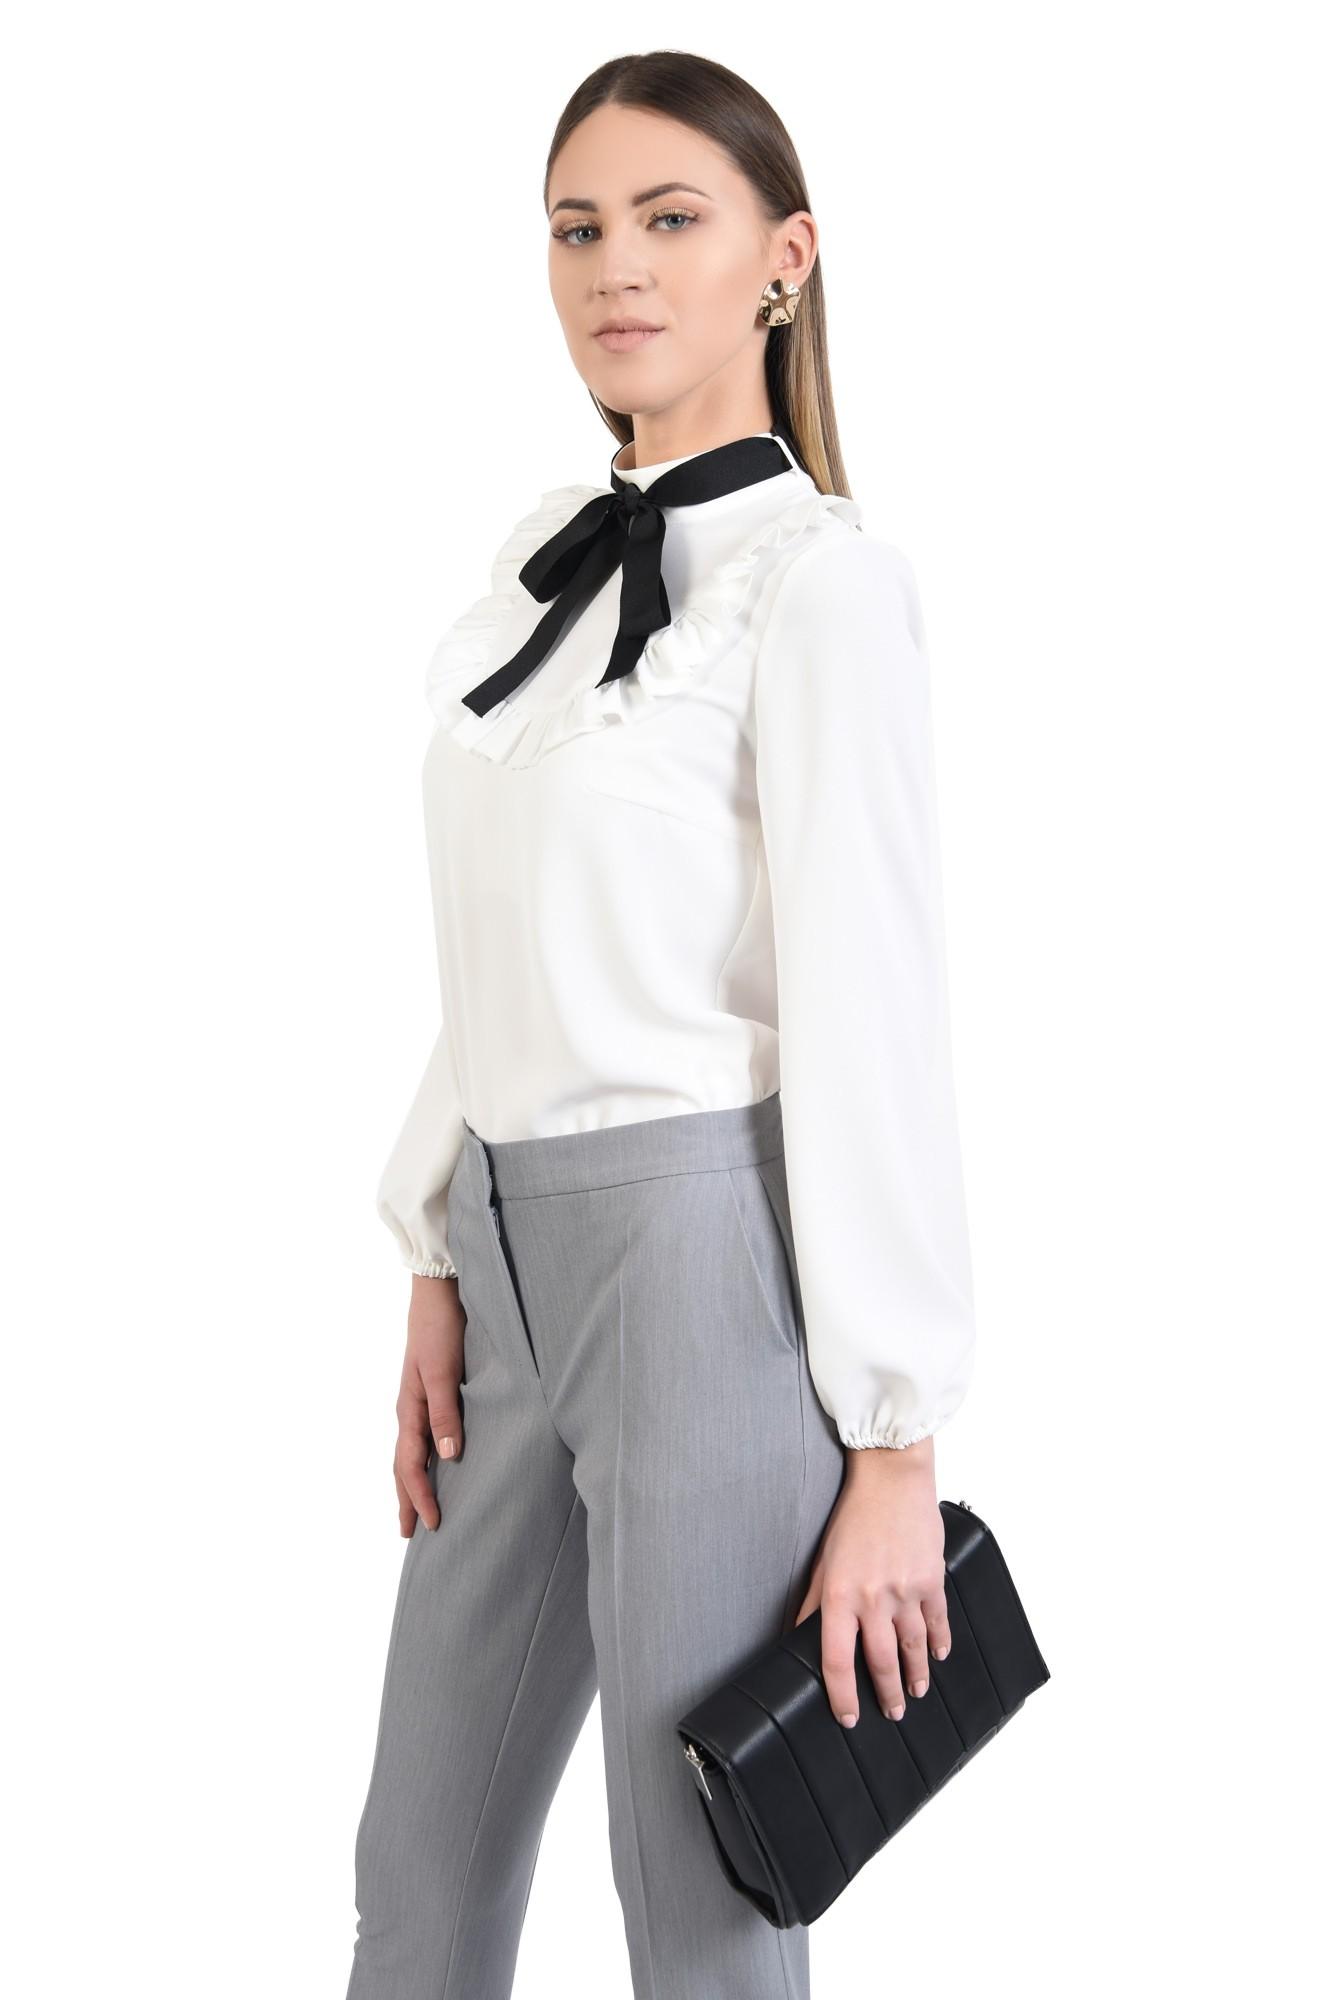 2 - pantaloni gri, office, croi conic, mansete